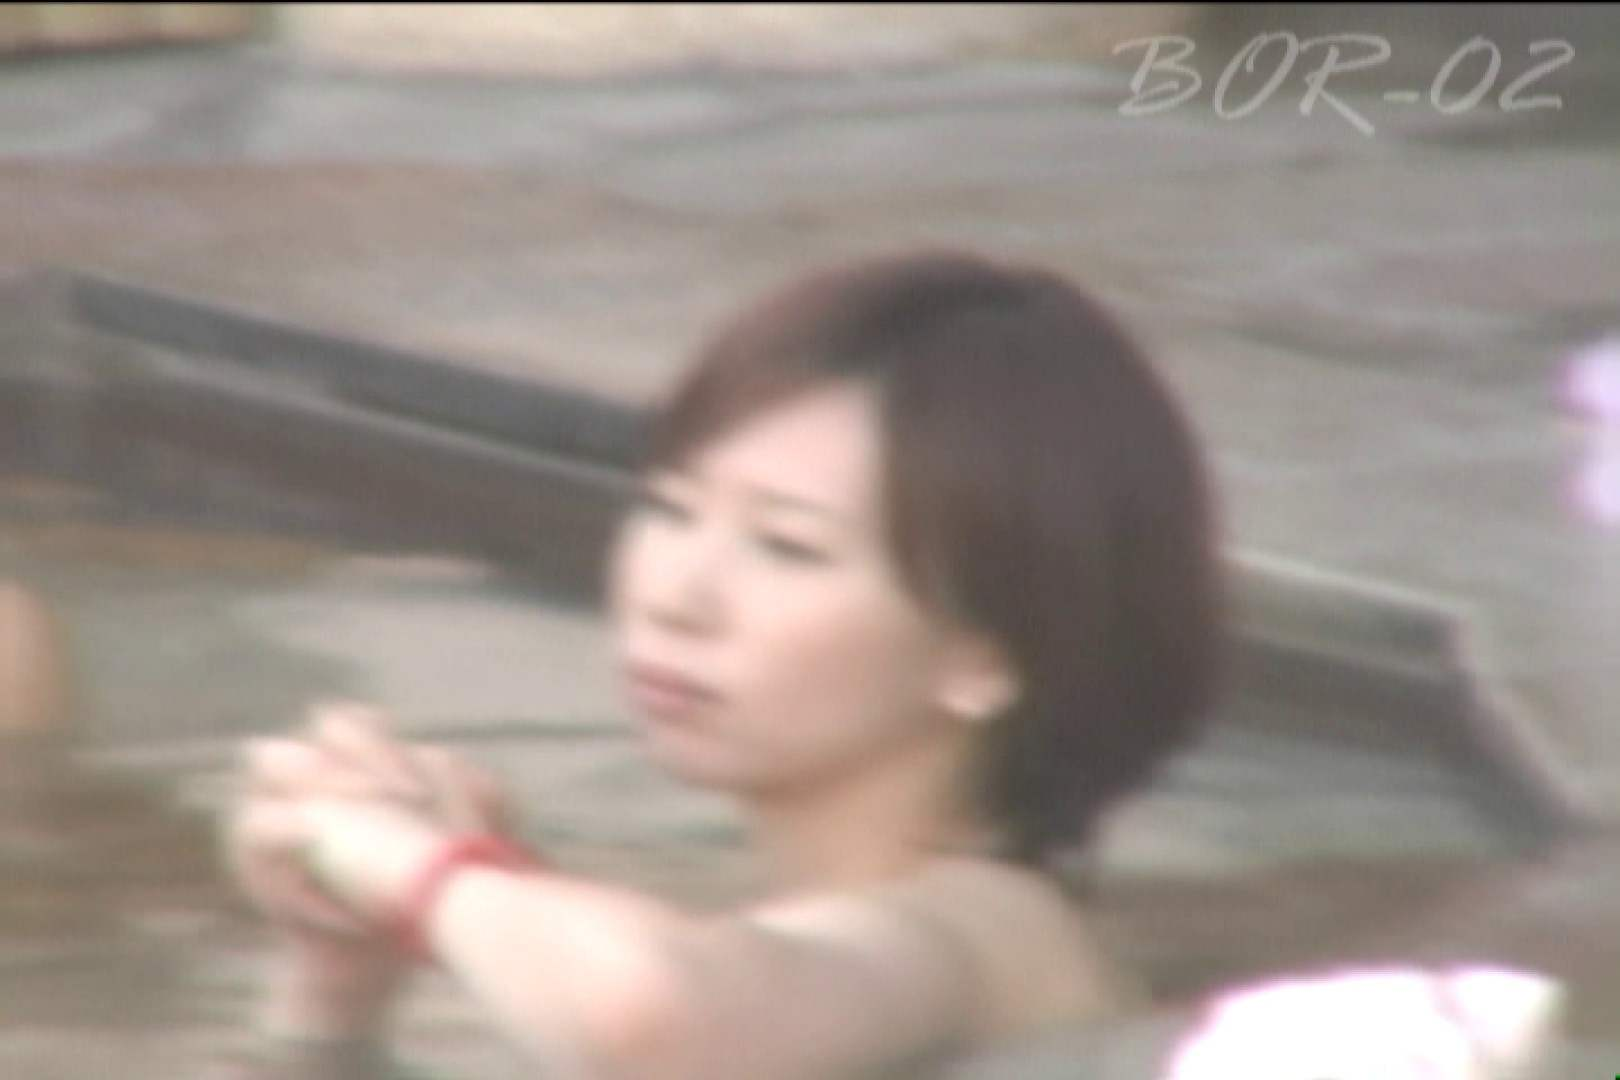 Aquaな露天風呂Vol.476 盗撮師作品 オマンコ無修正動画無料 85pic 32